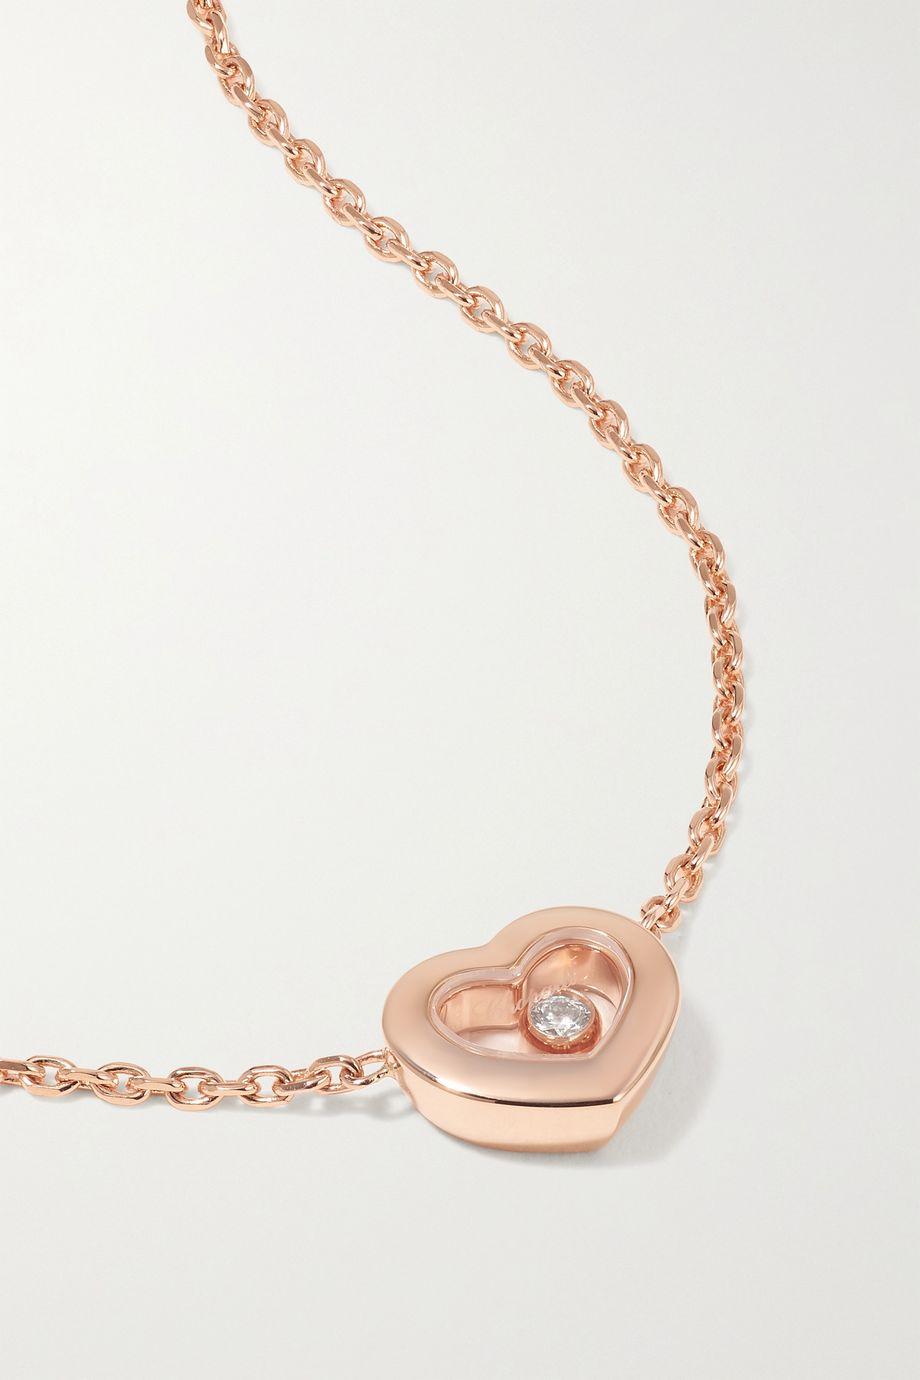 Chopard + NET SUSTAIN Happy Diamonds Kette aus 18 Karat Roségold mit Diamant